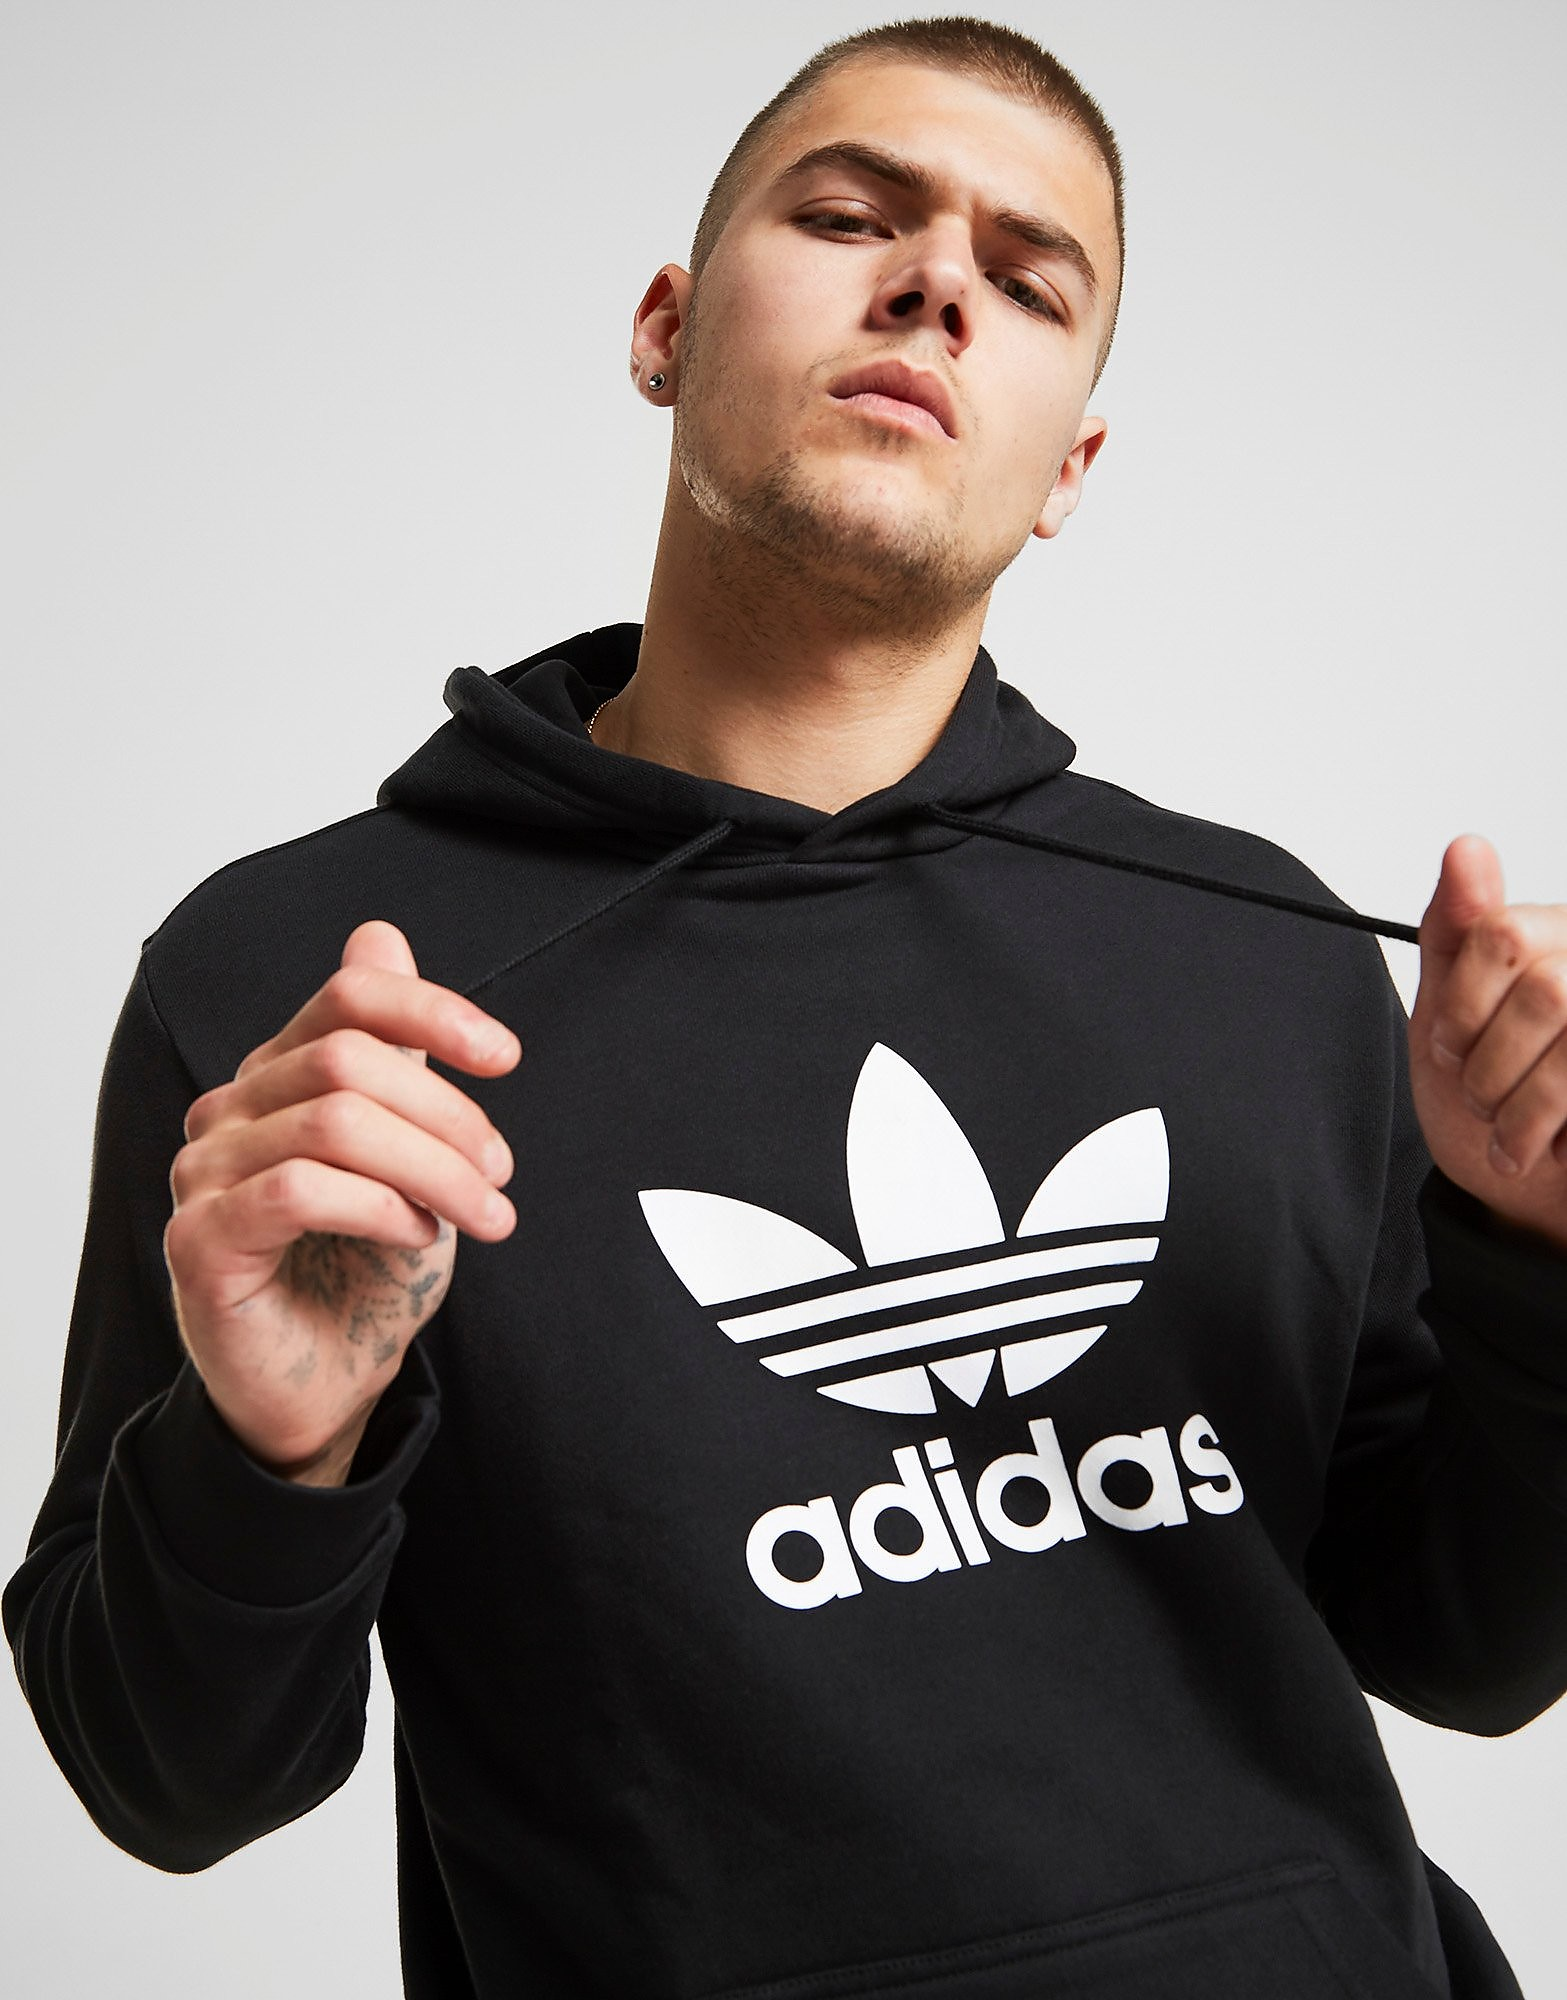 adidas Originals Trefoil State Overhead Hoody